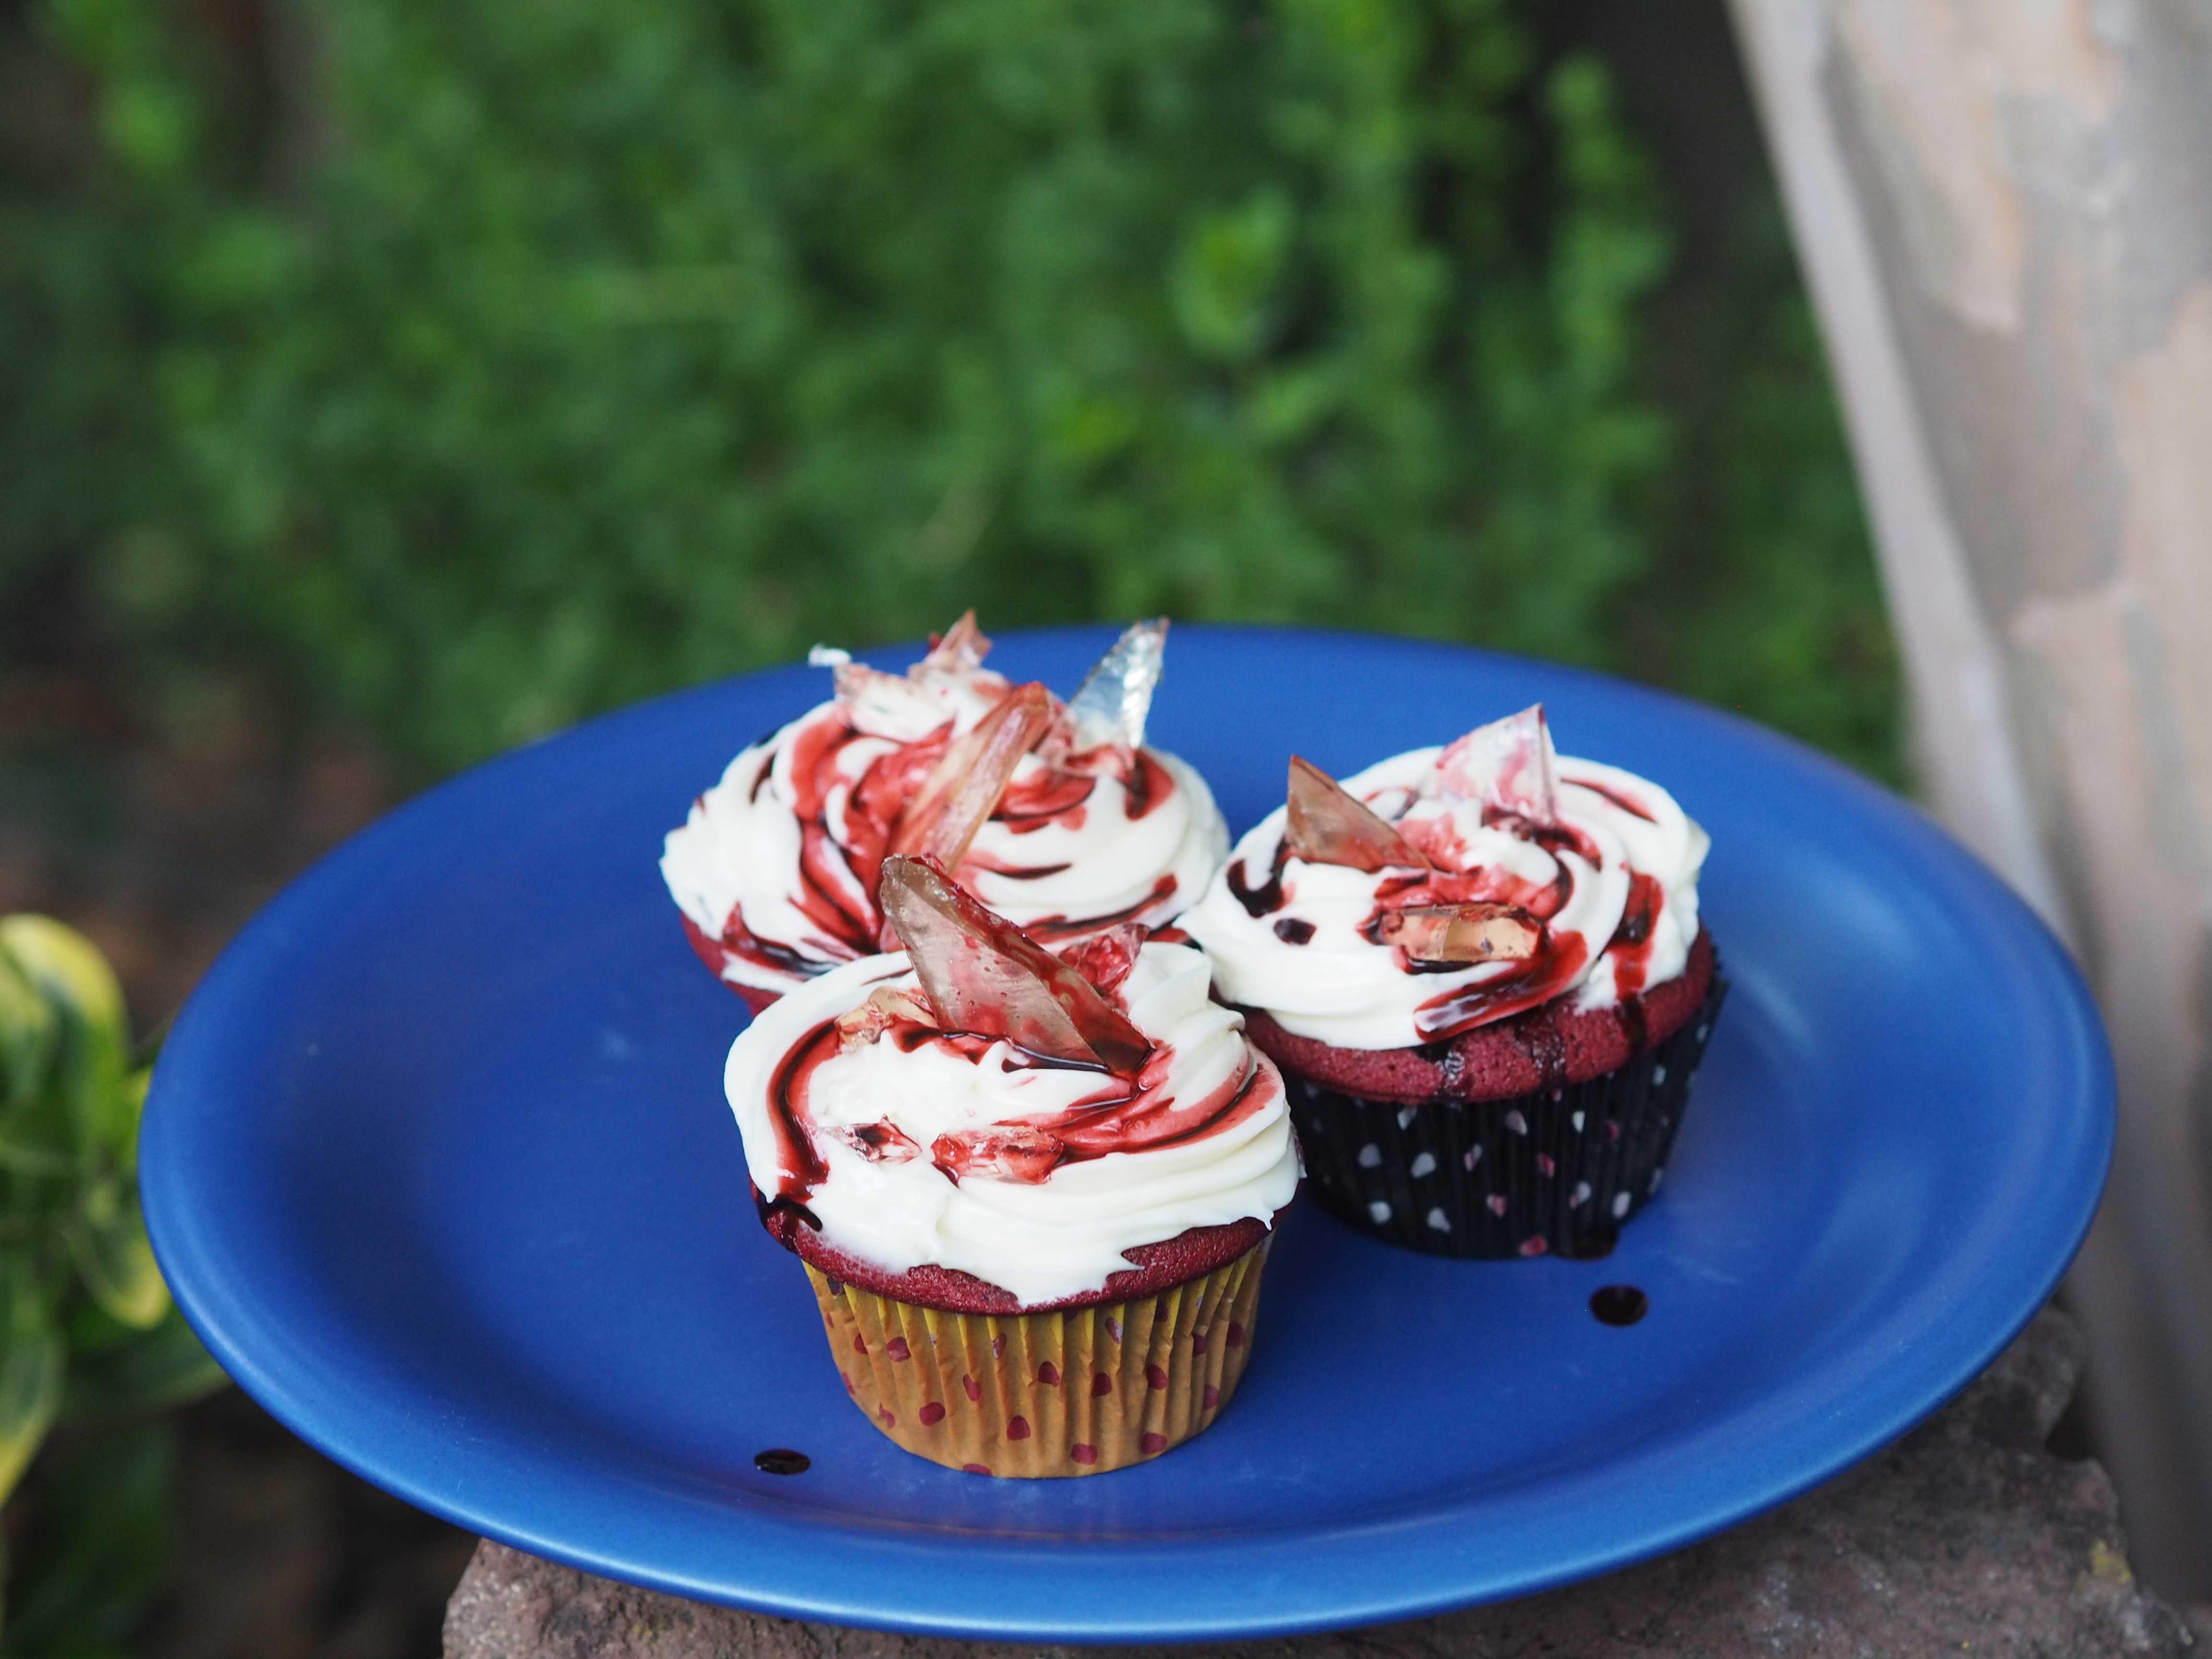 Bloody Red Velvet Cupcakes